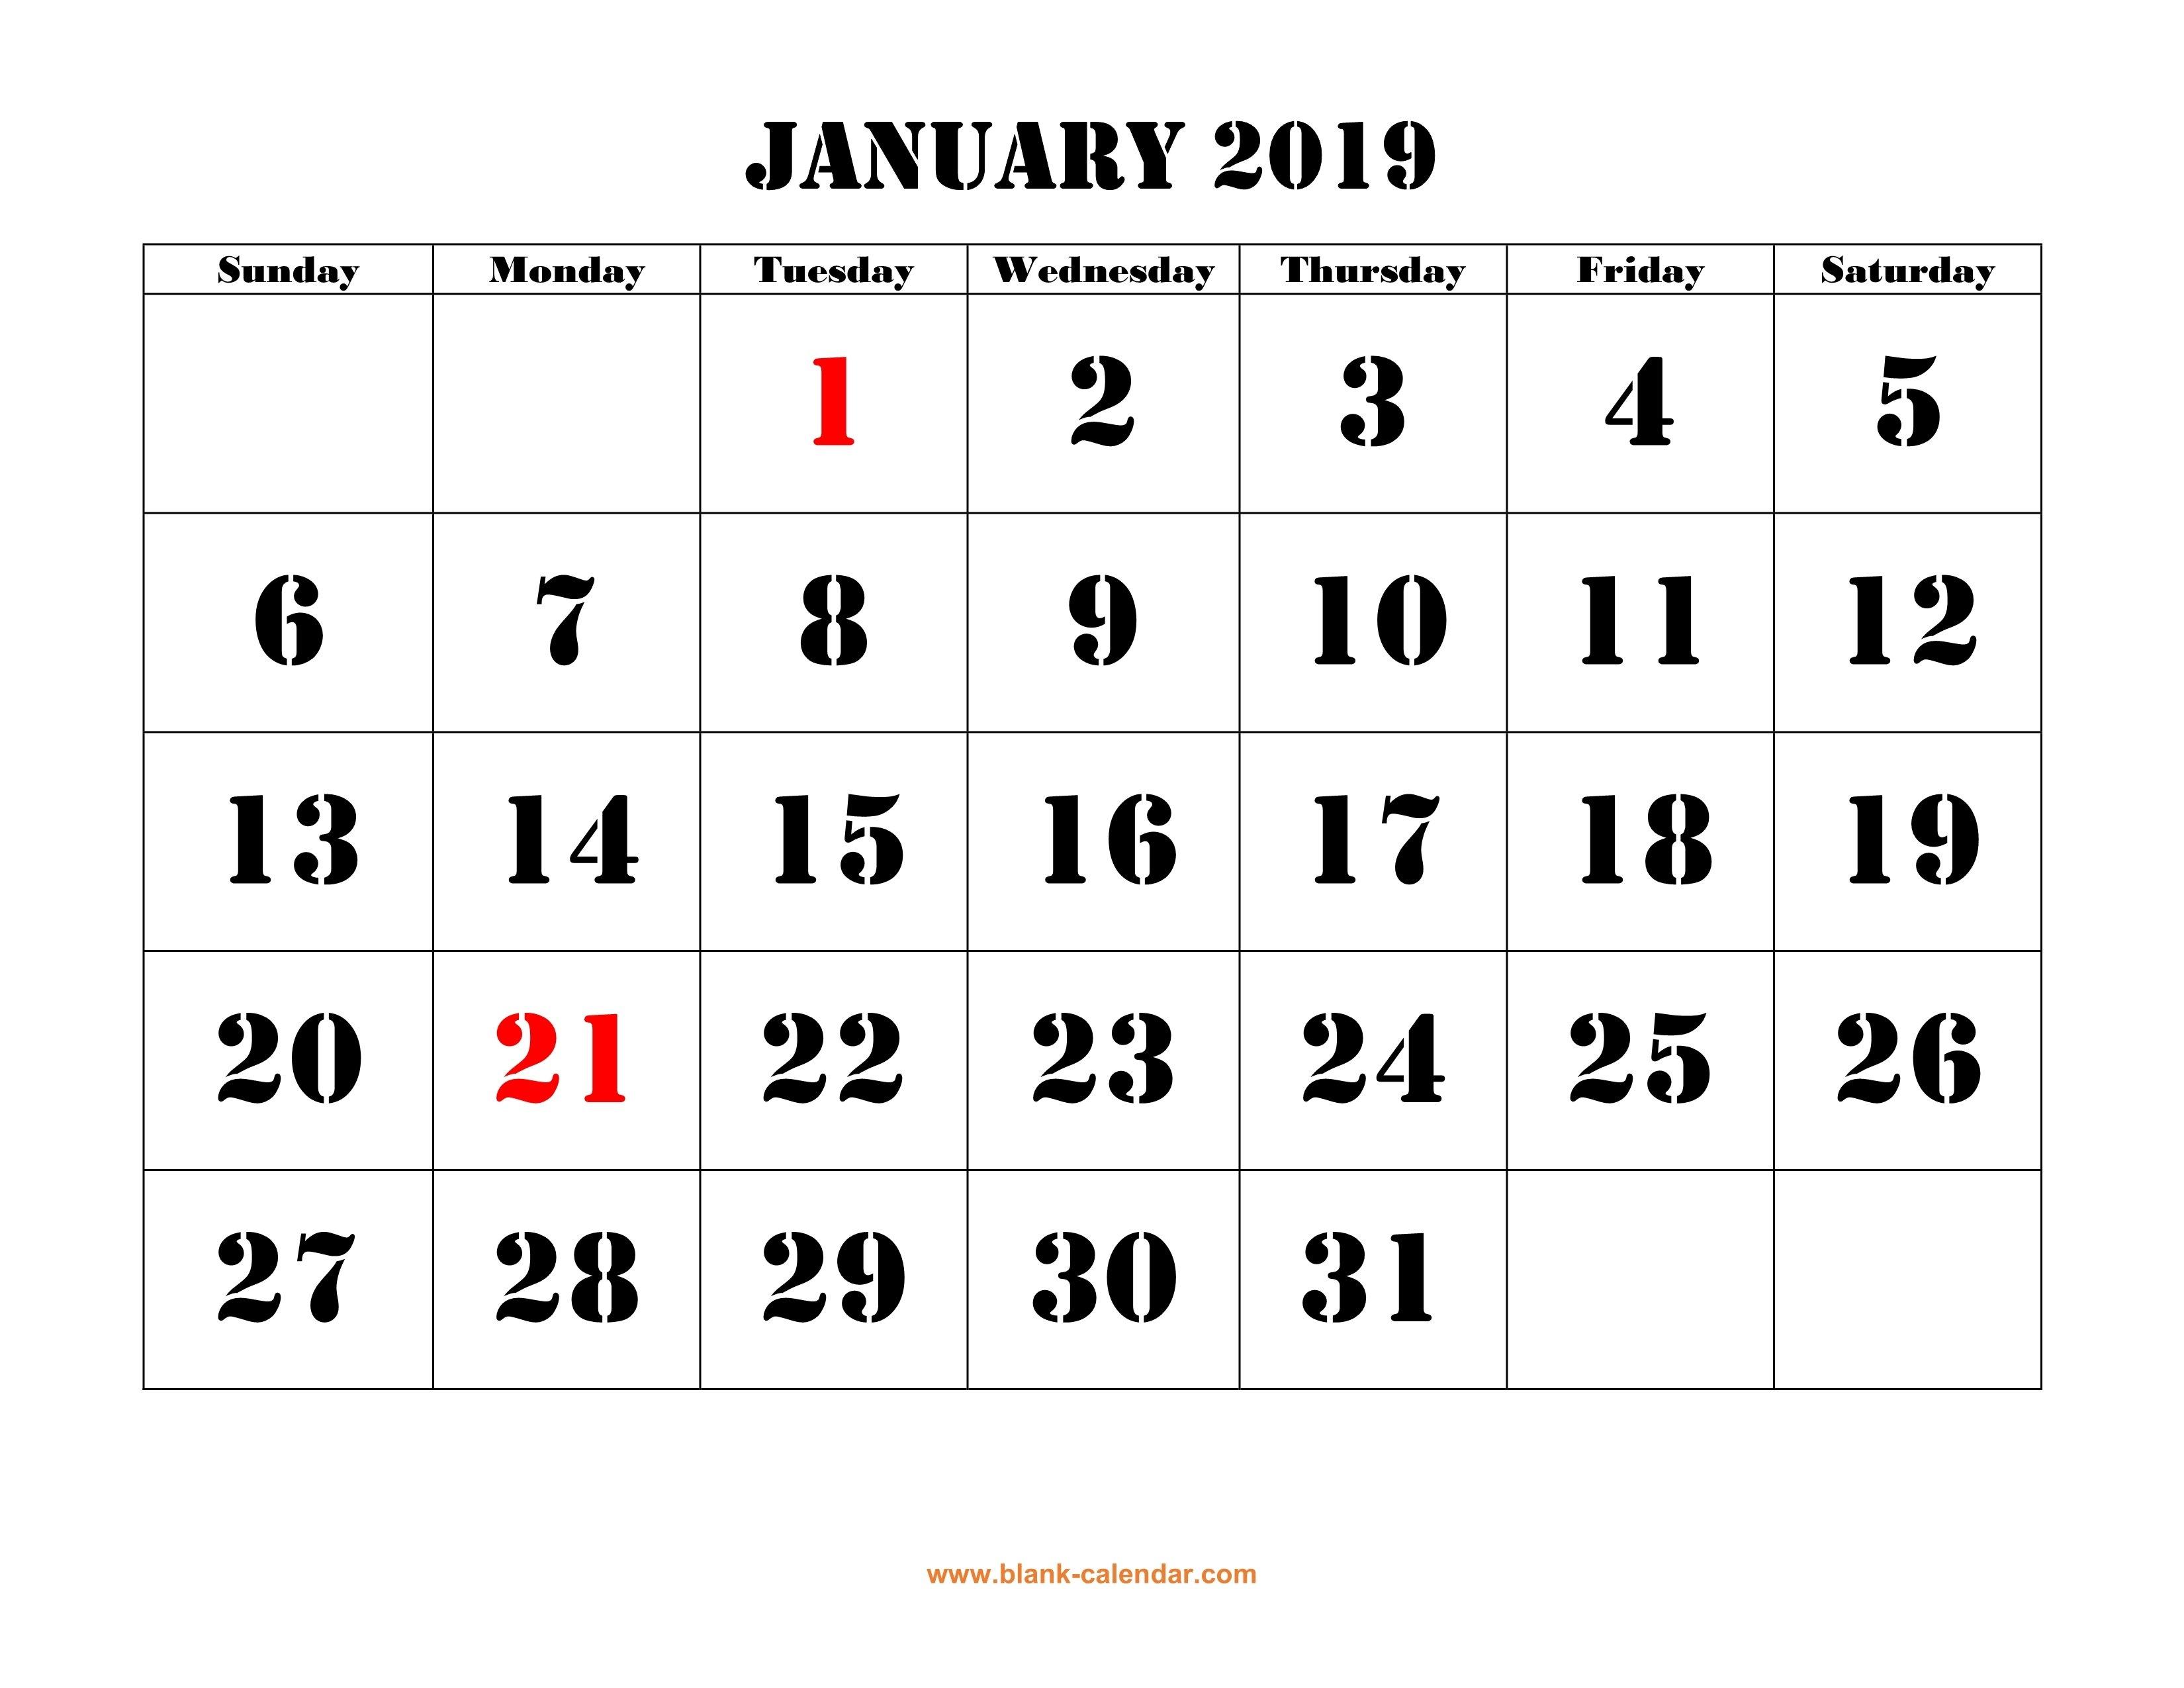 Free Download Printable January 2019 Calendar, Large Font Design January 9 2019 Calendar